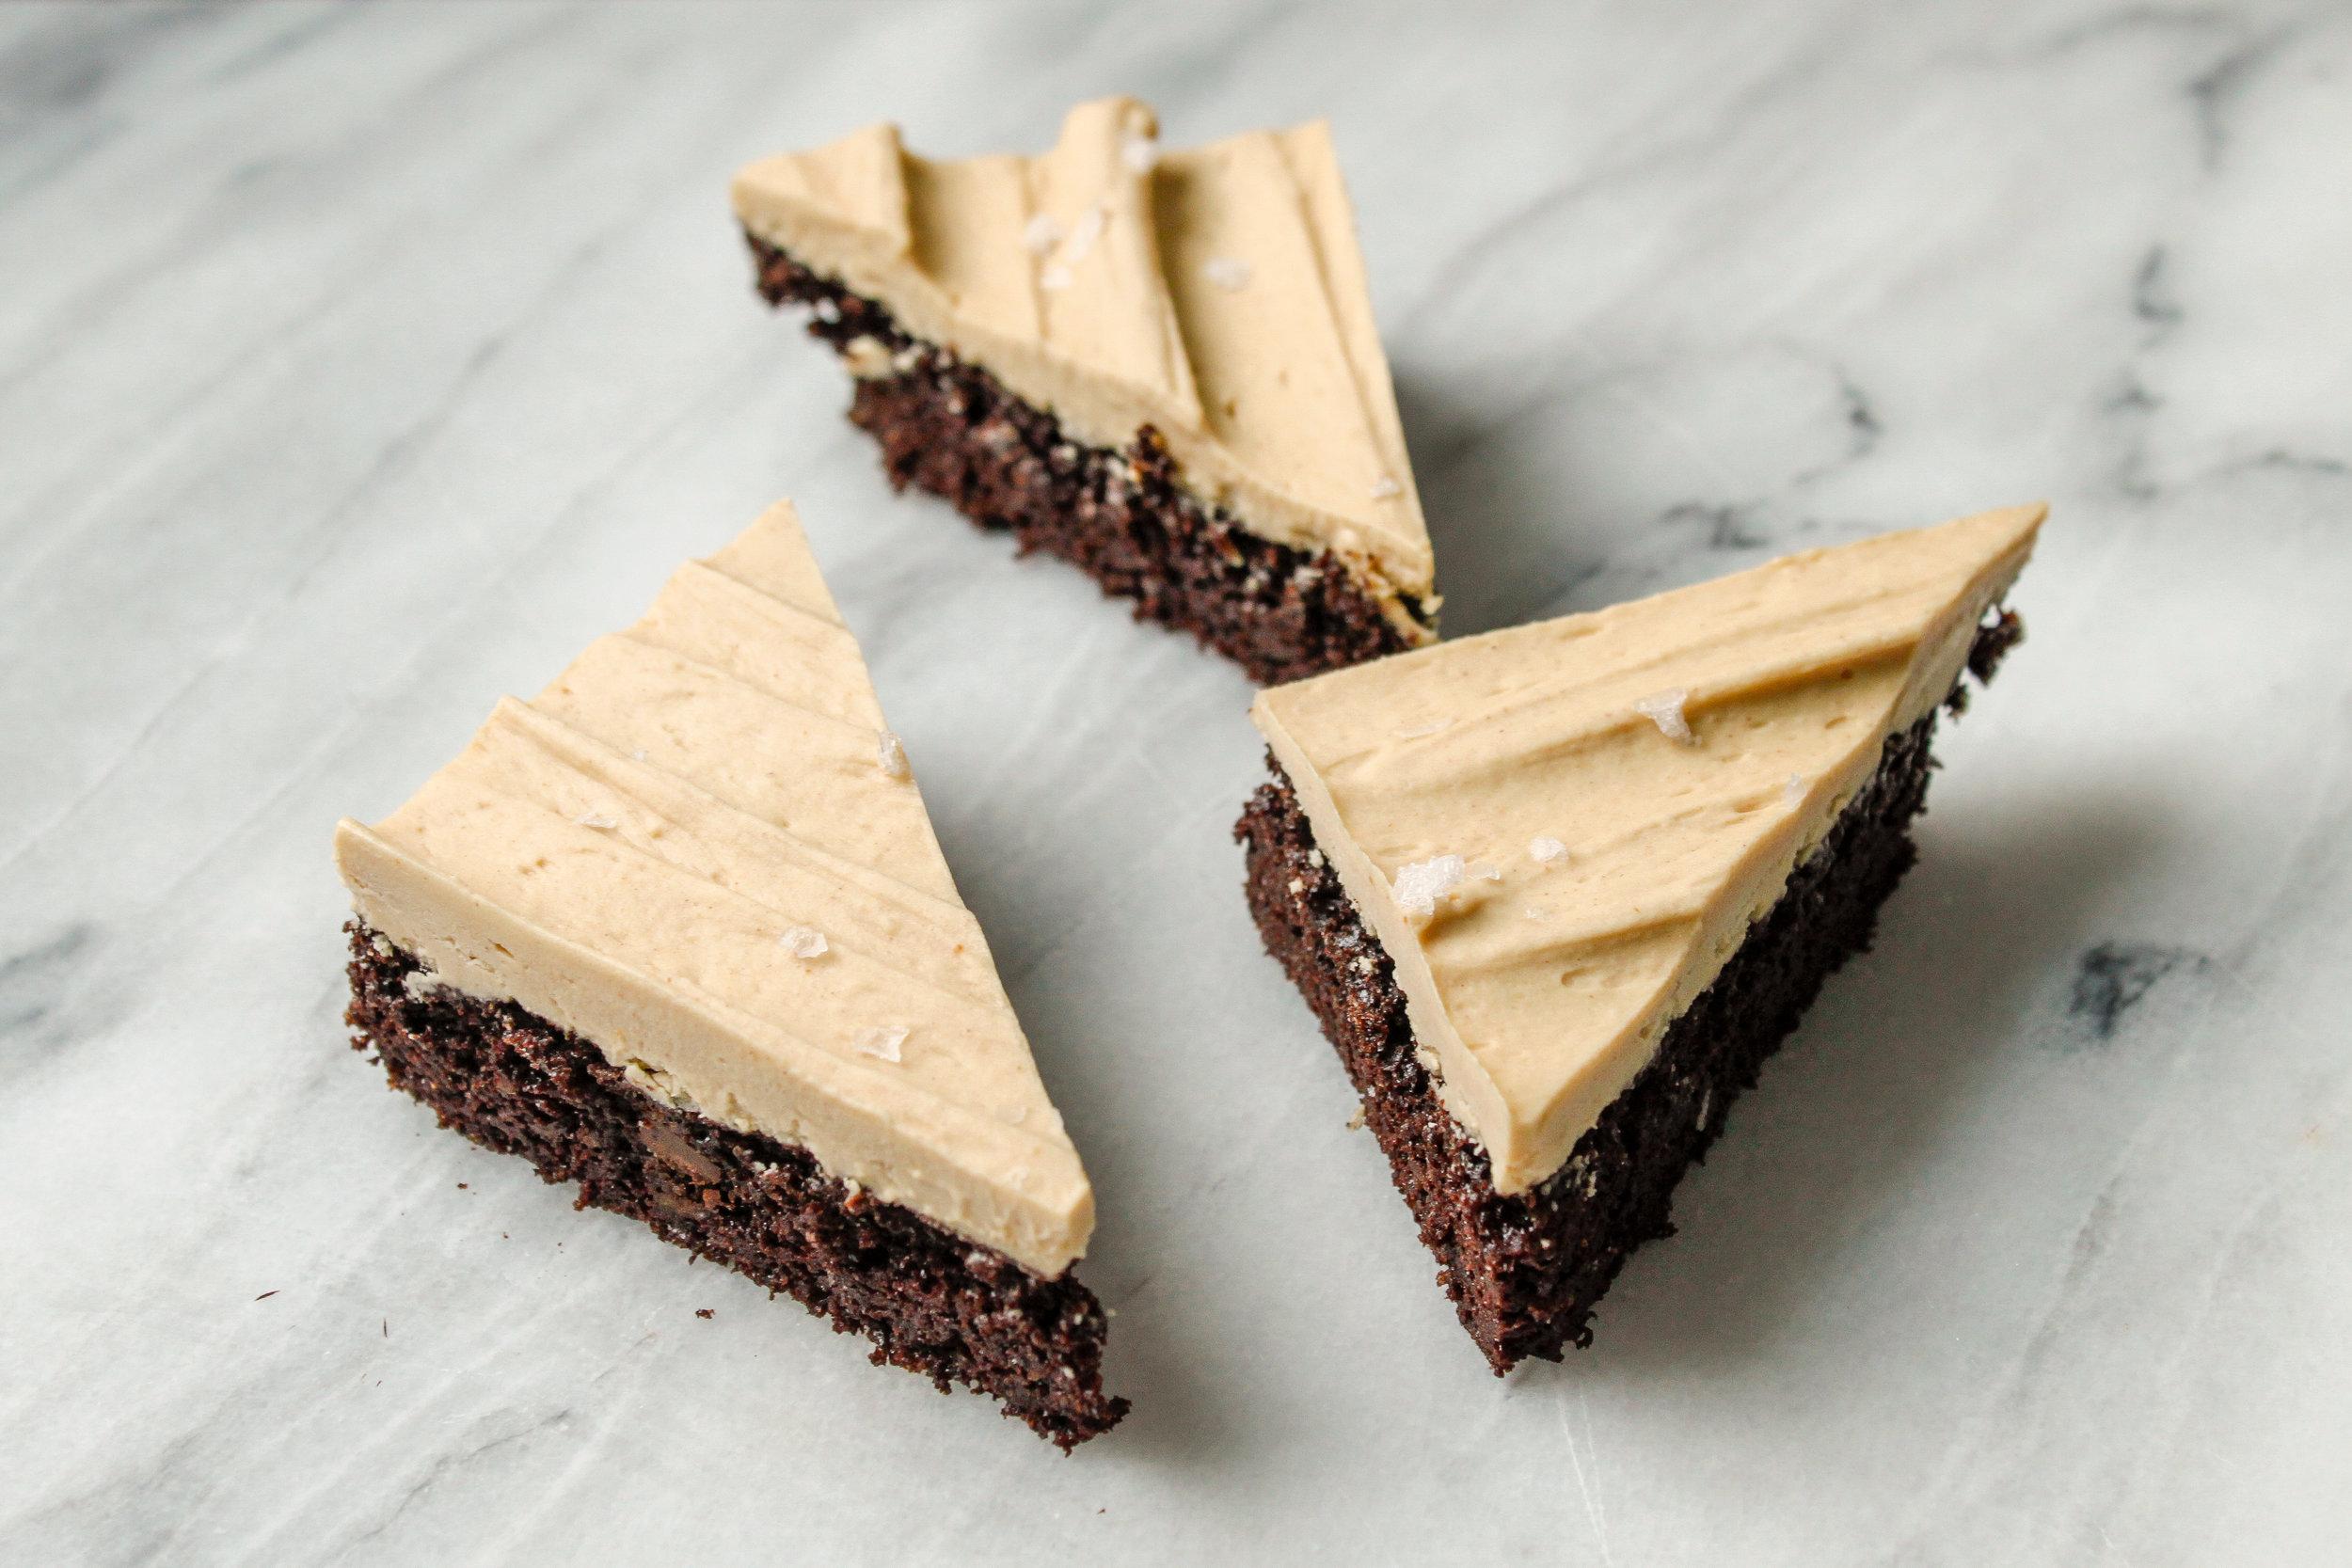 Vegan/Gluten Free Peanut Butter Cake